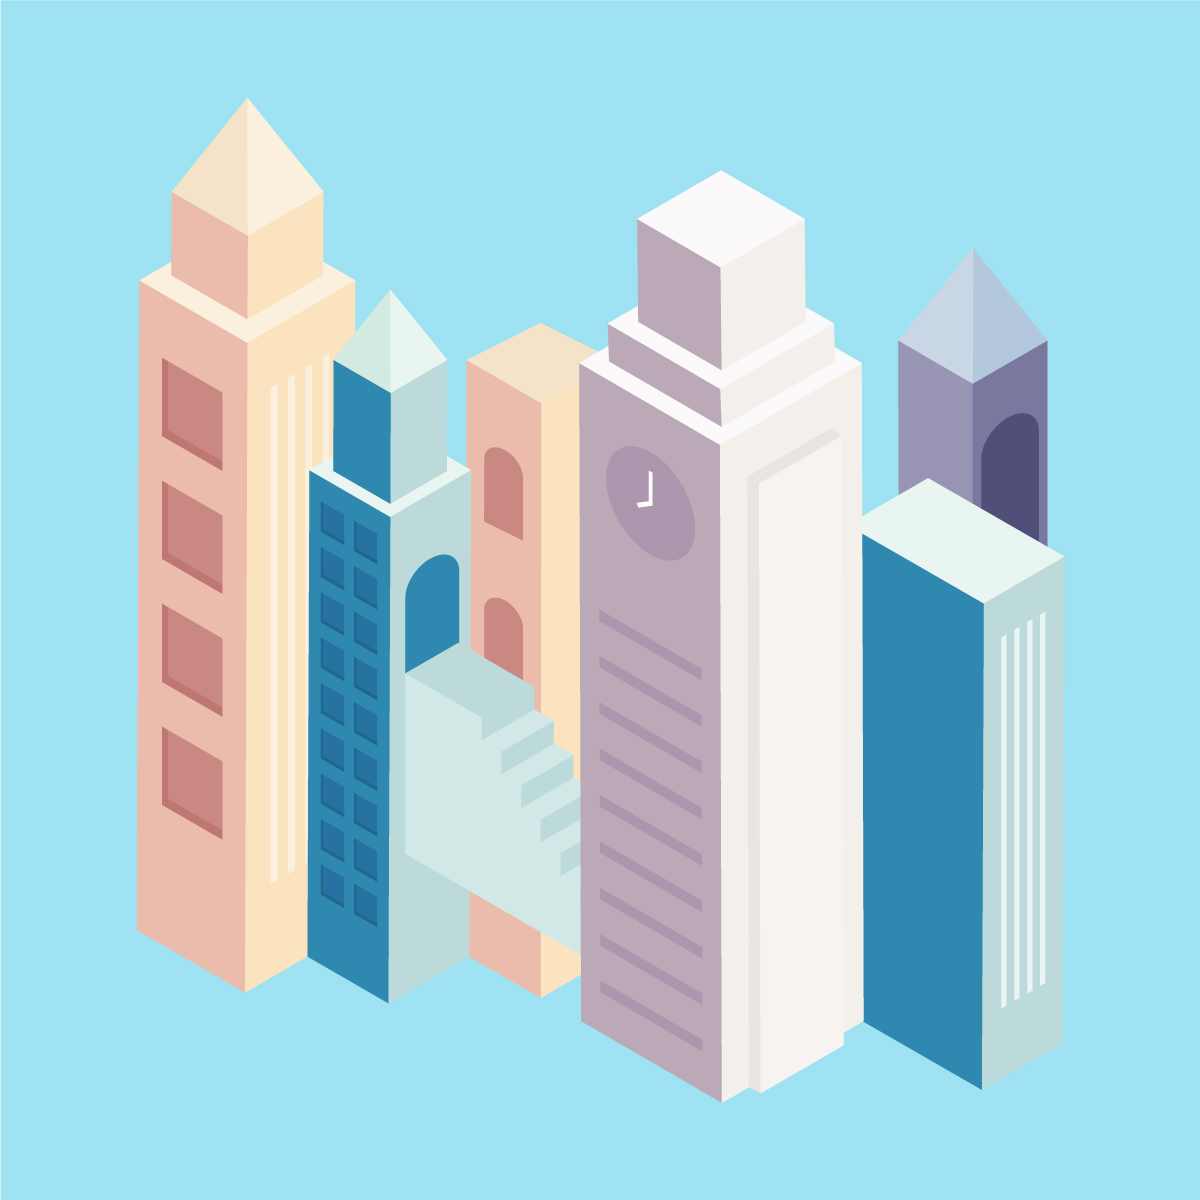 Building Construction Illustration